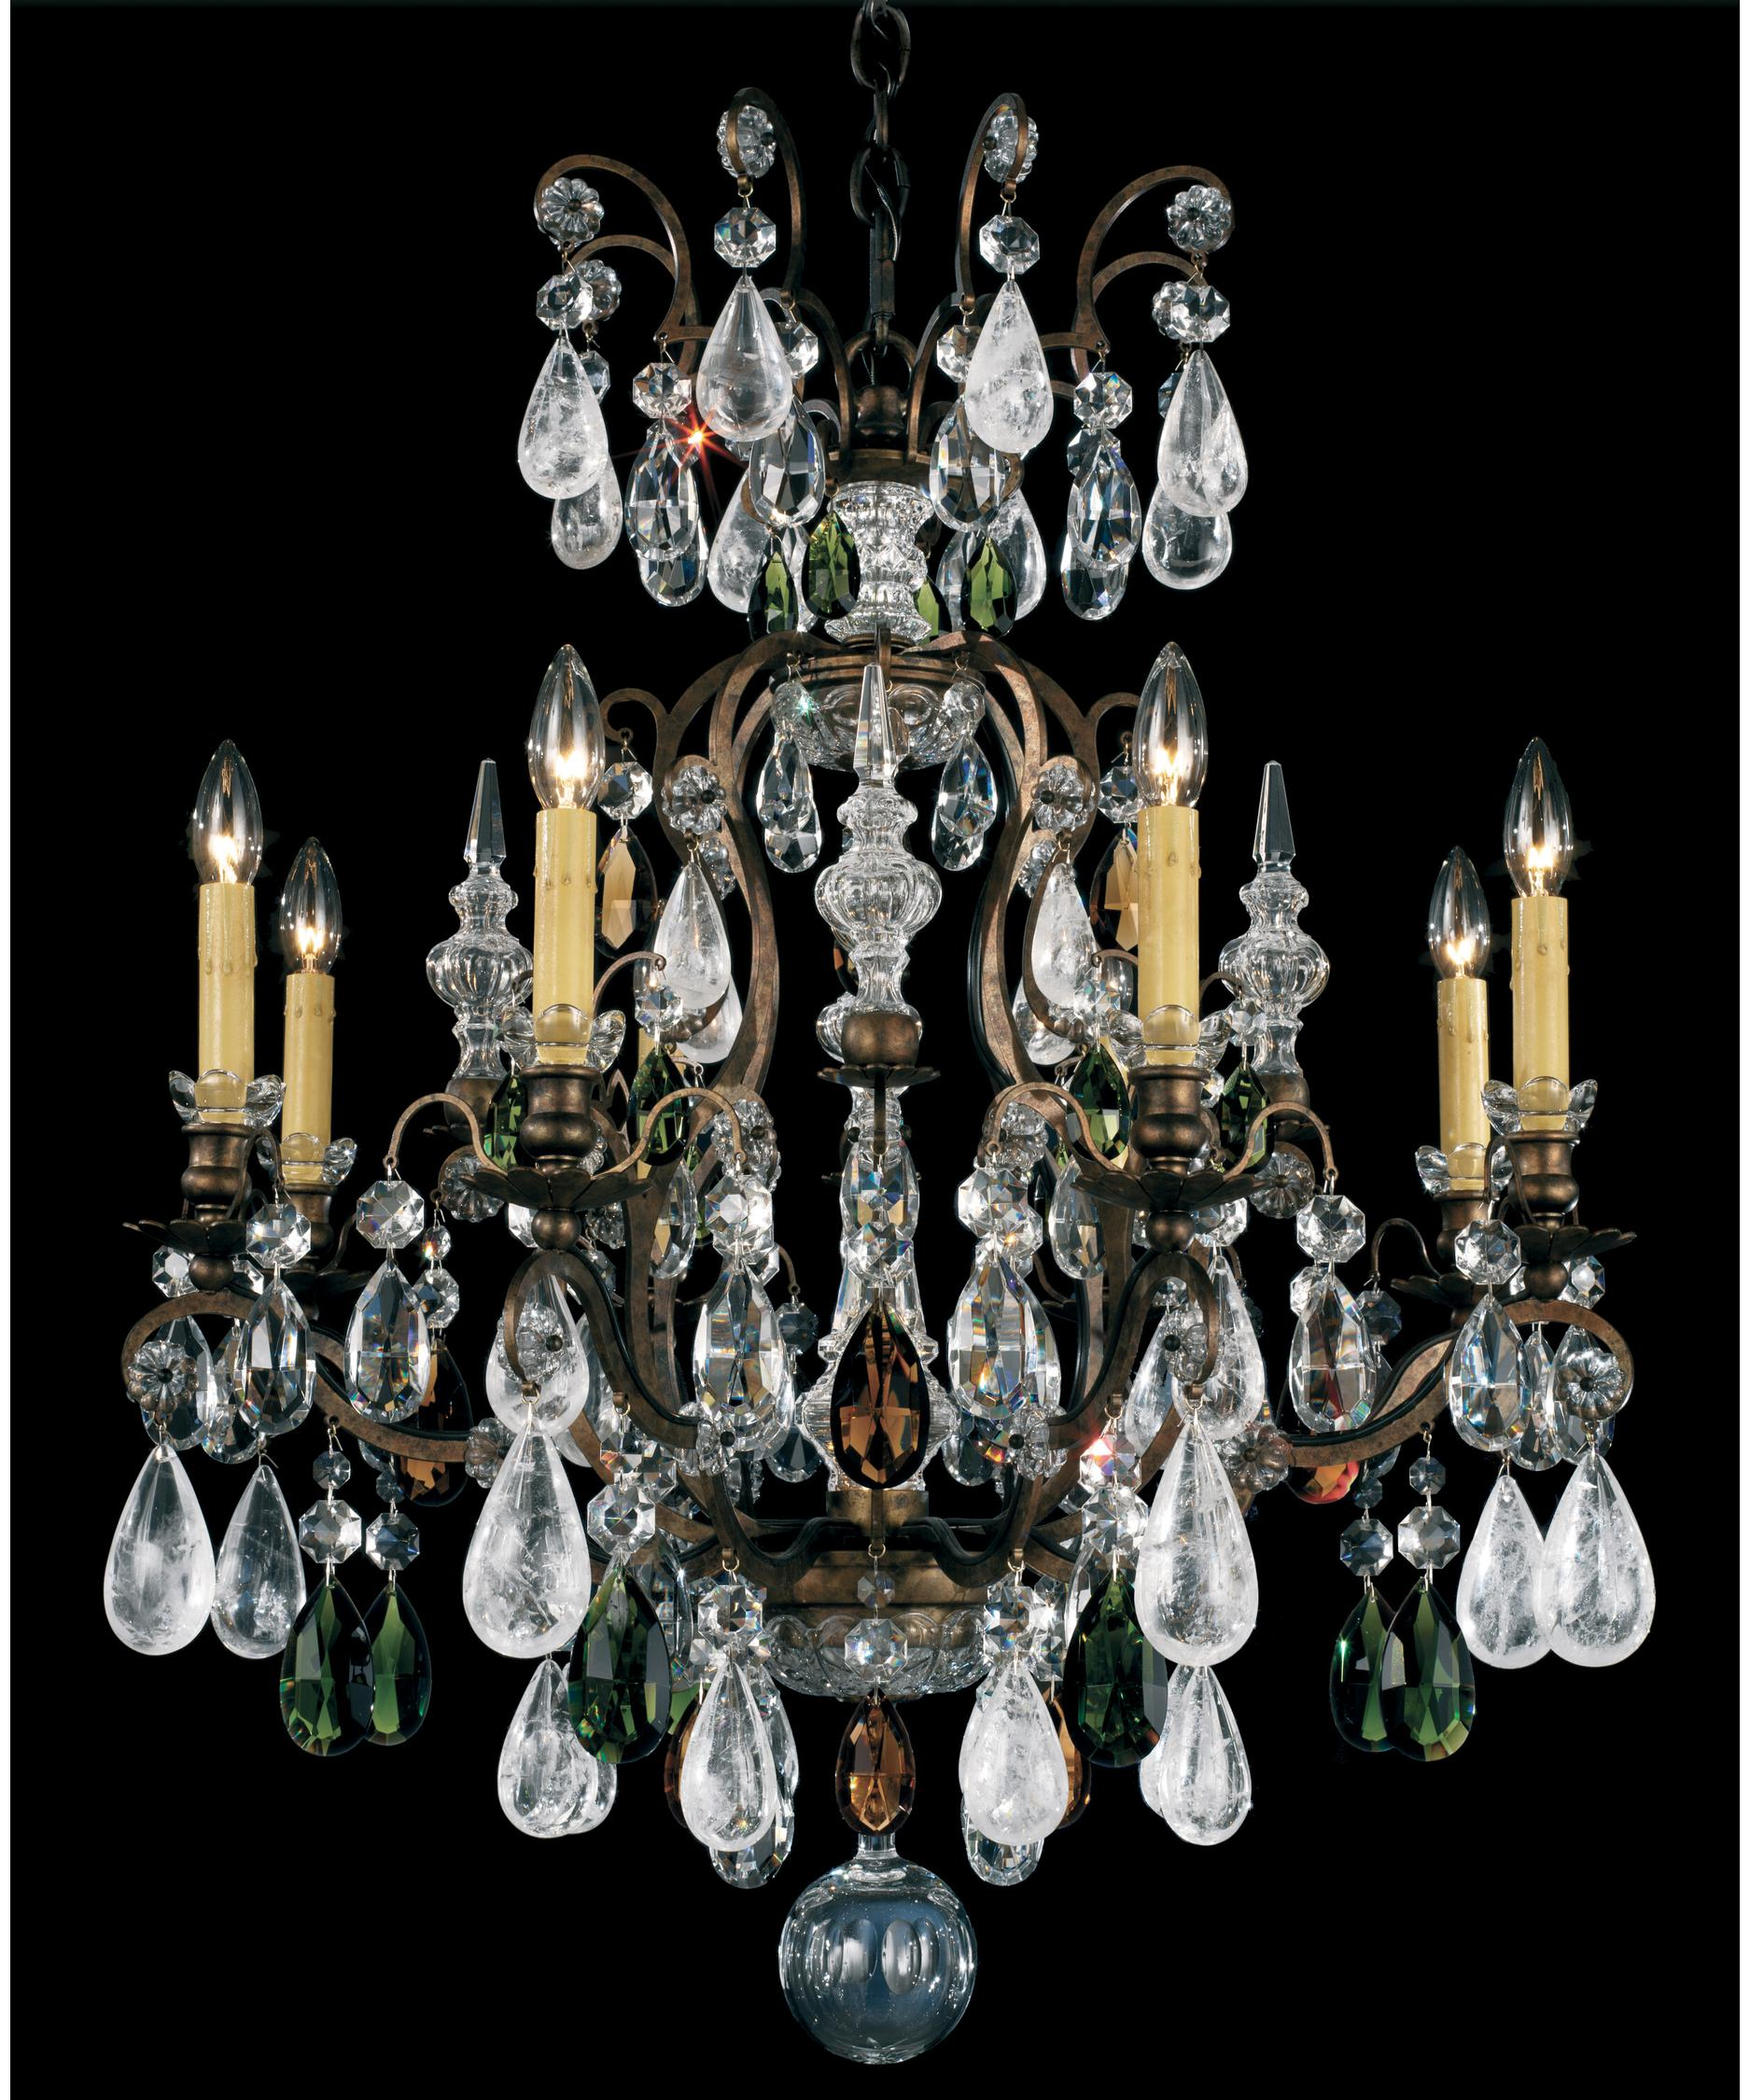 schonbek renaissance rock crystal 27 inch wide 8 light chandelier capitol lighting - Schonbek Chandelier